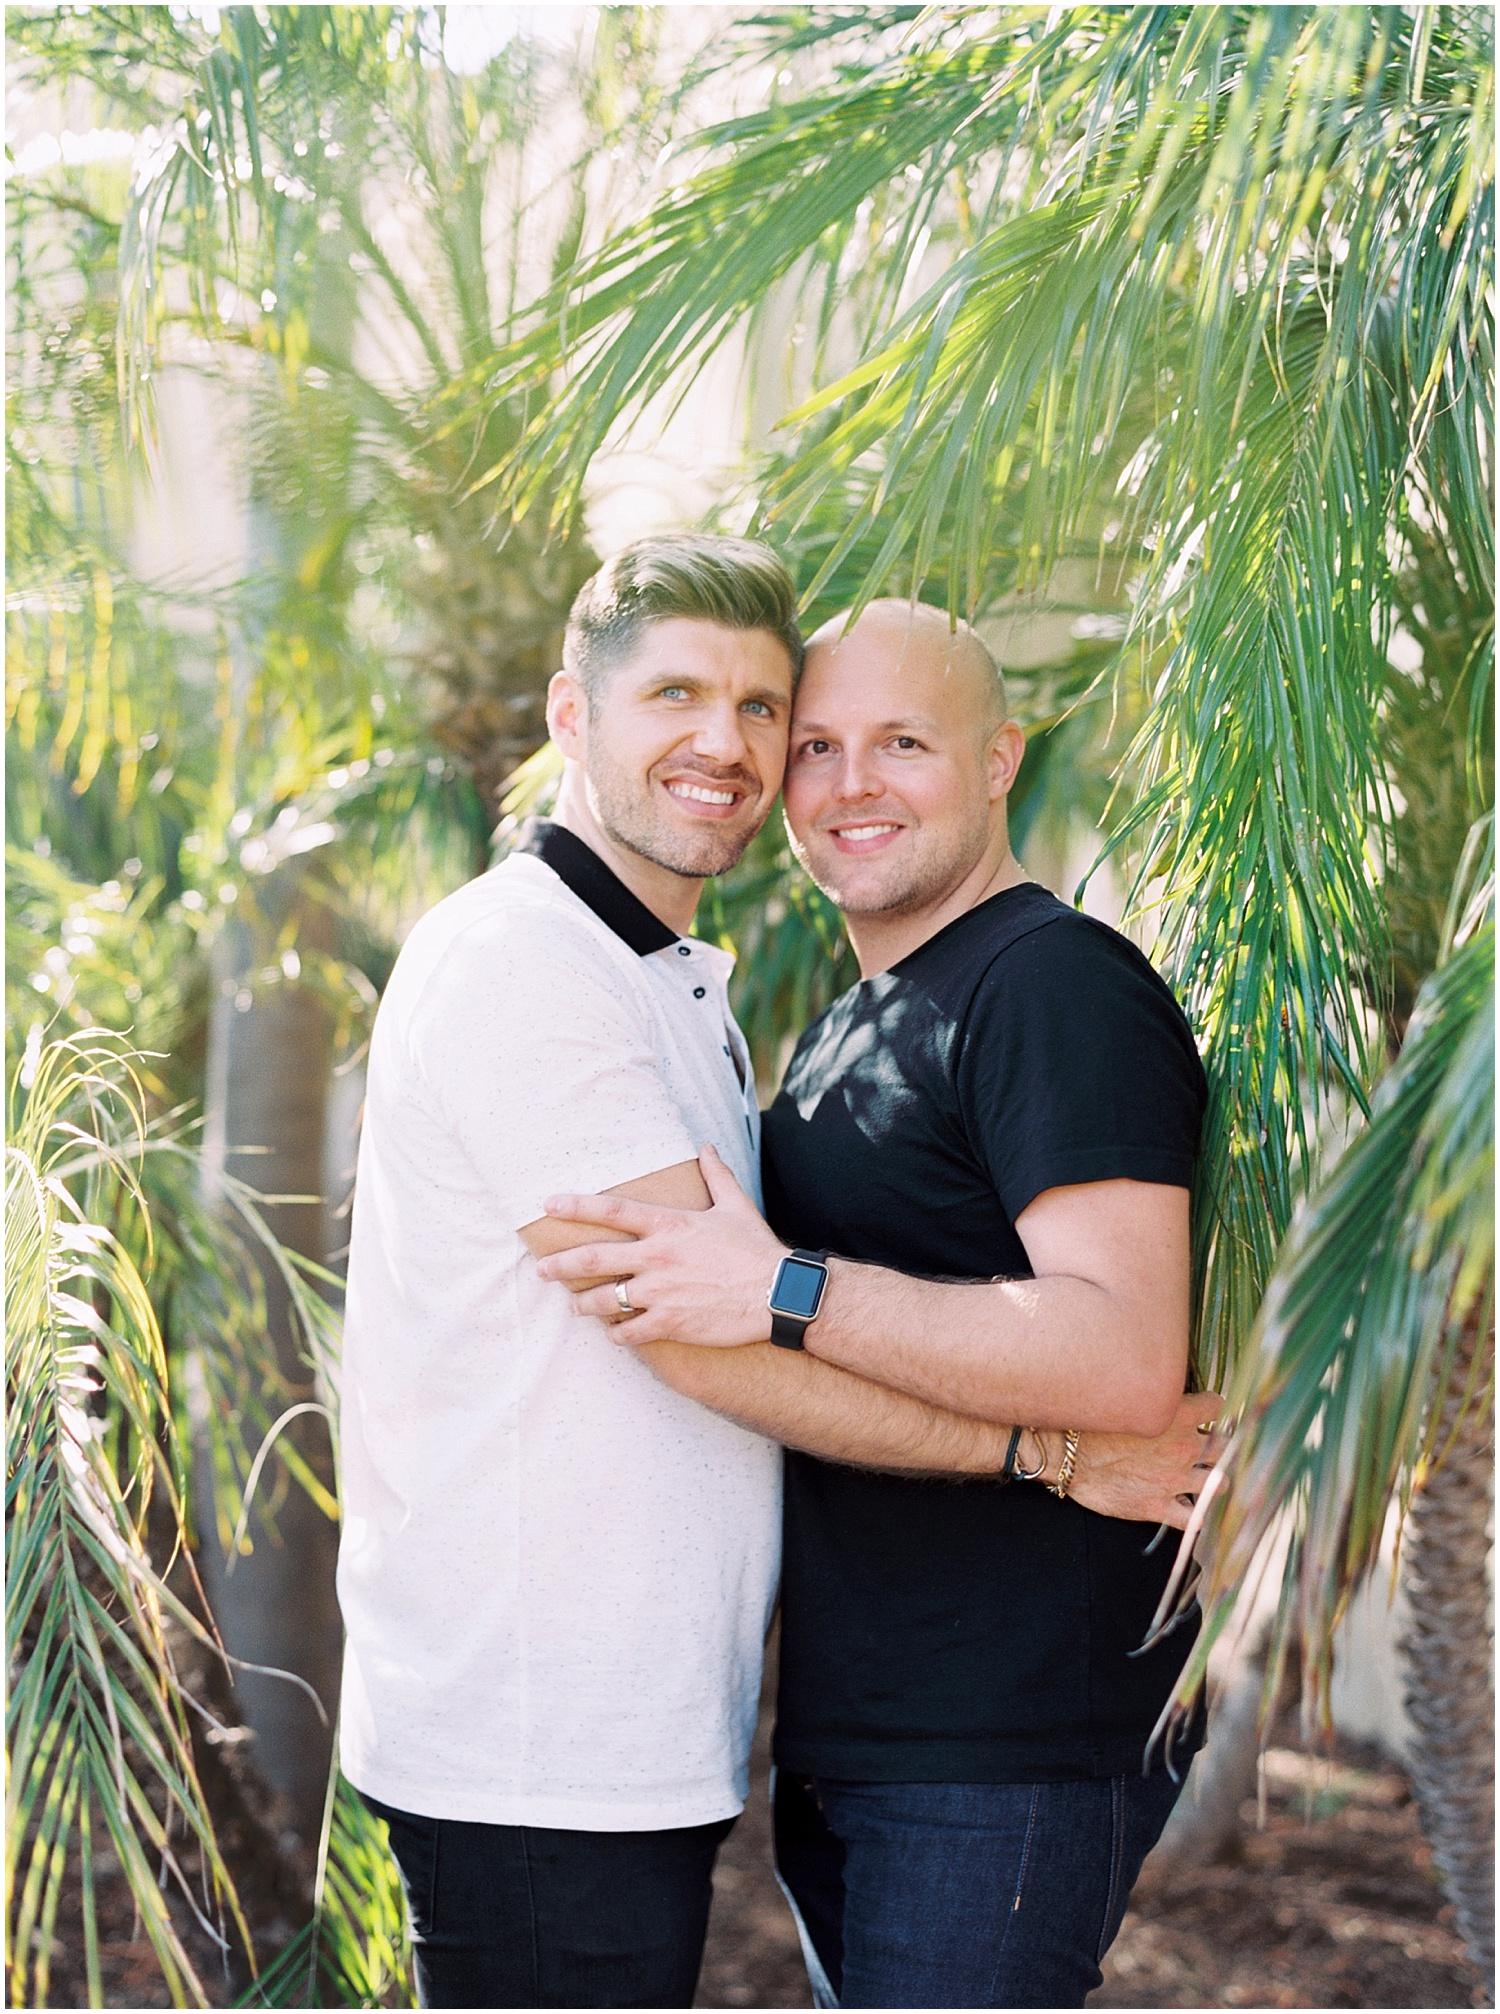 San_Francisco_Same_Sex_Wedding_photographer-13.jpg